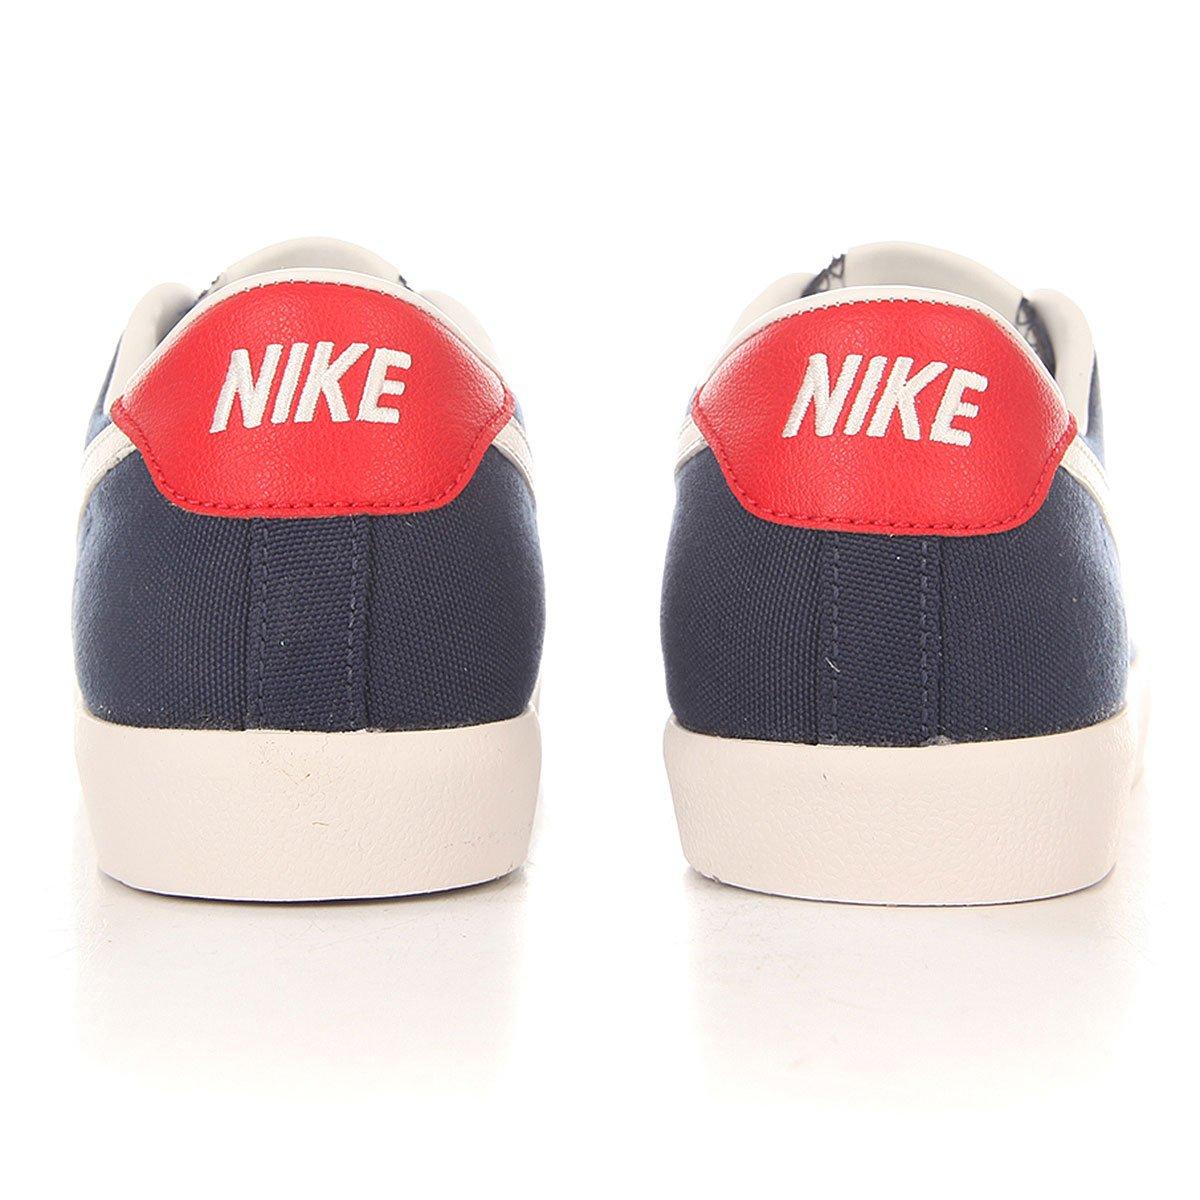 size 40 909b4 d4b40 ... Кеды низкие Nike Zoom All Court Ck Midnight Navy Smmt White ...